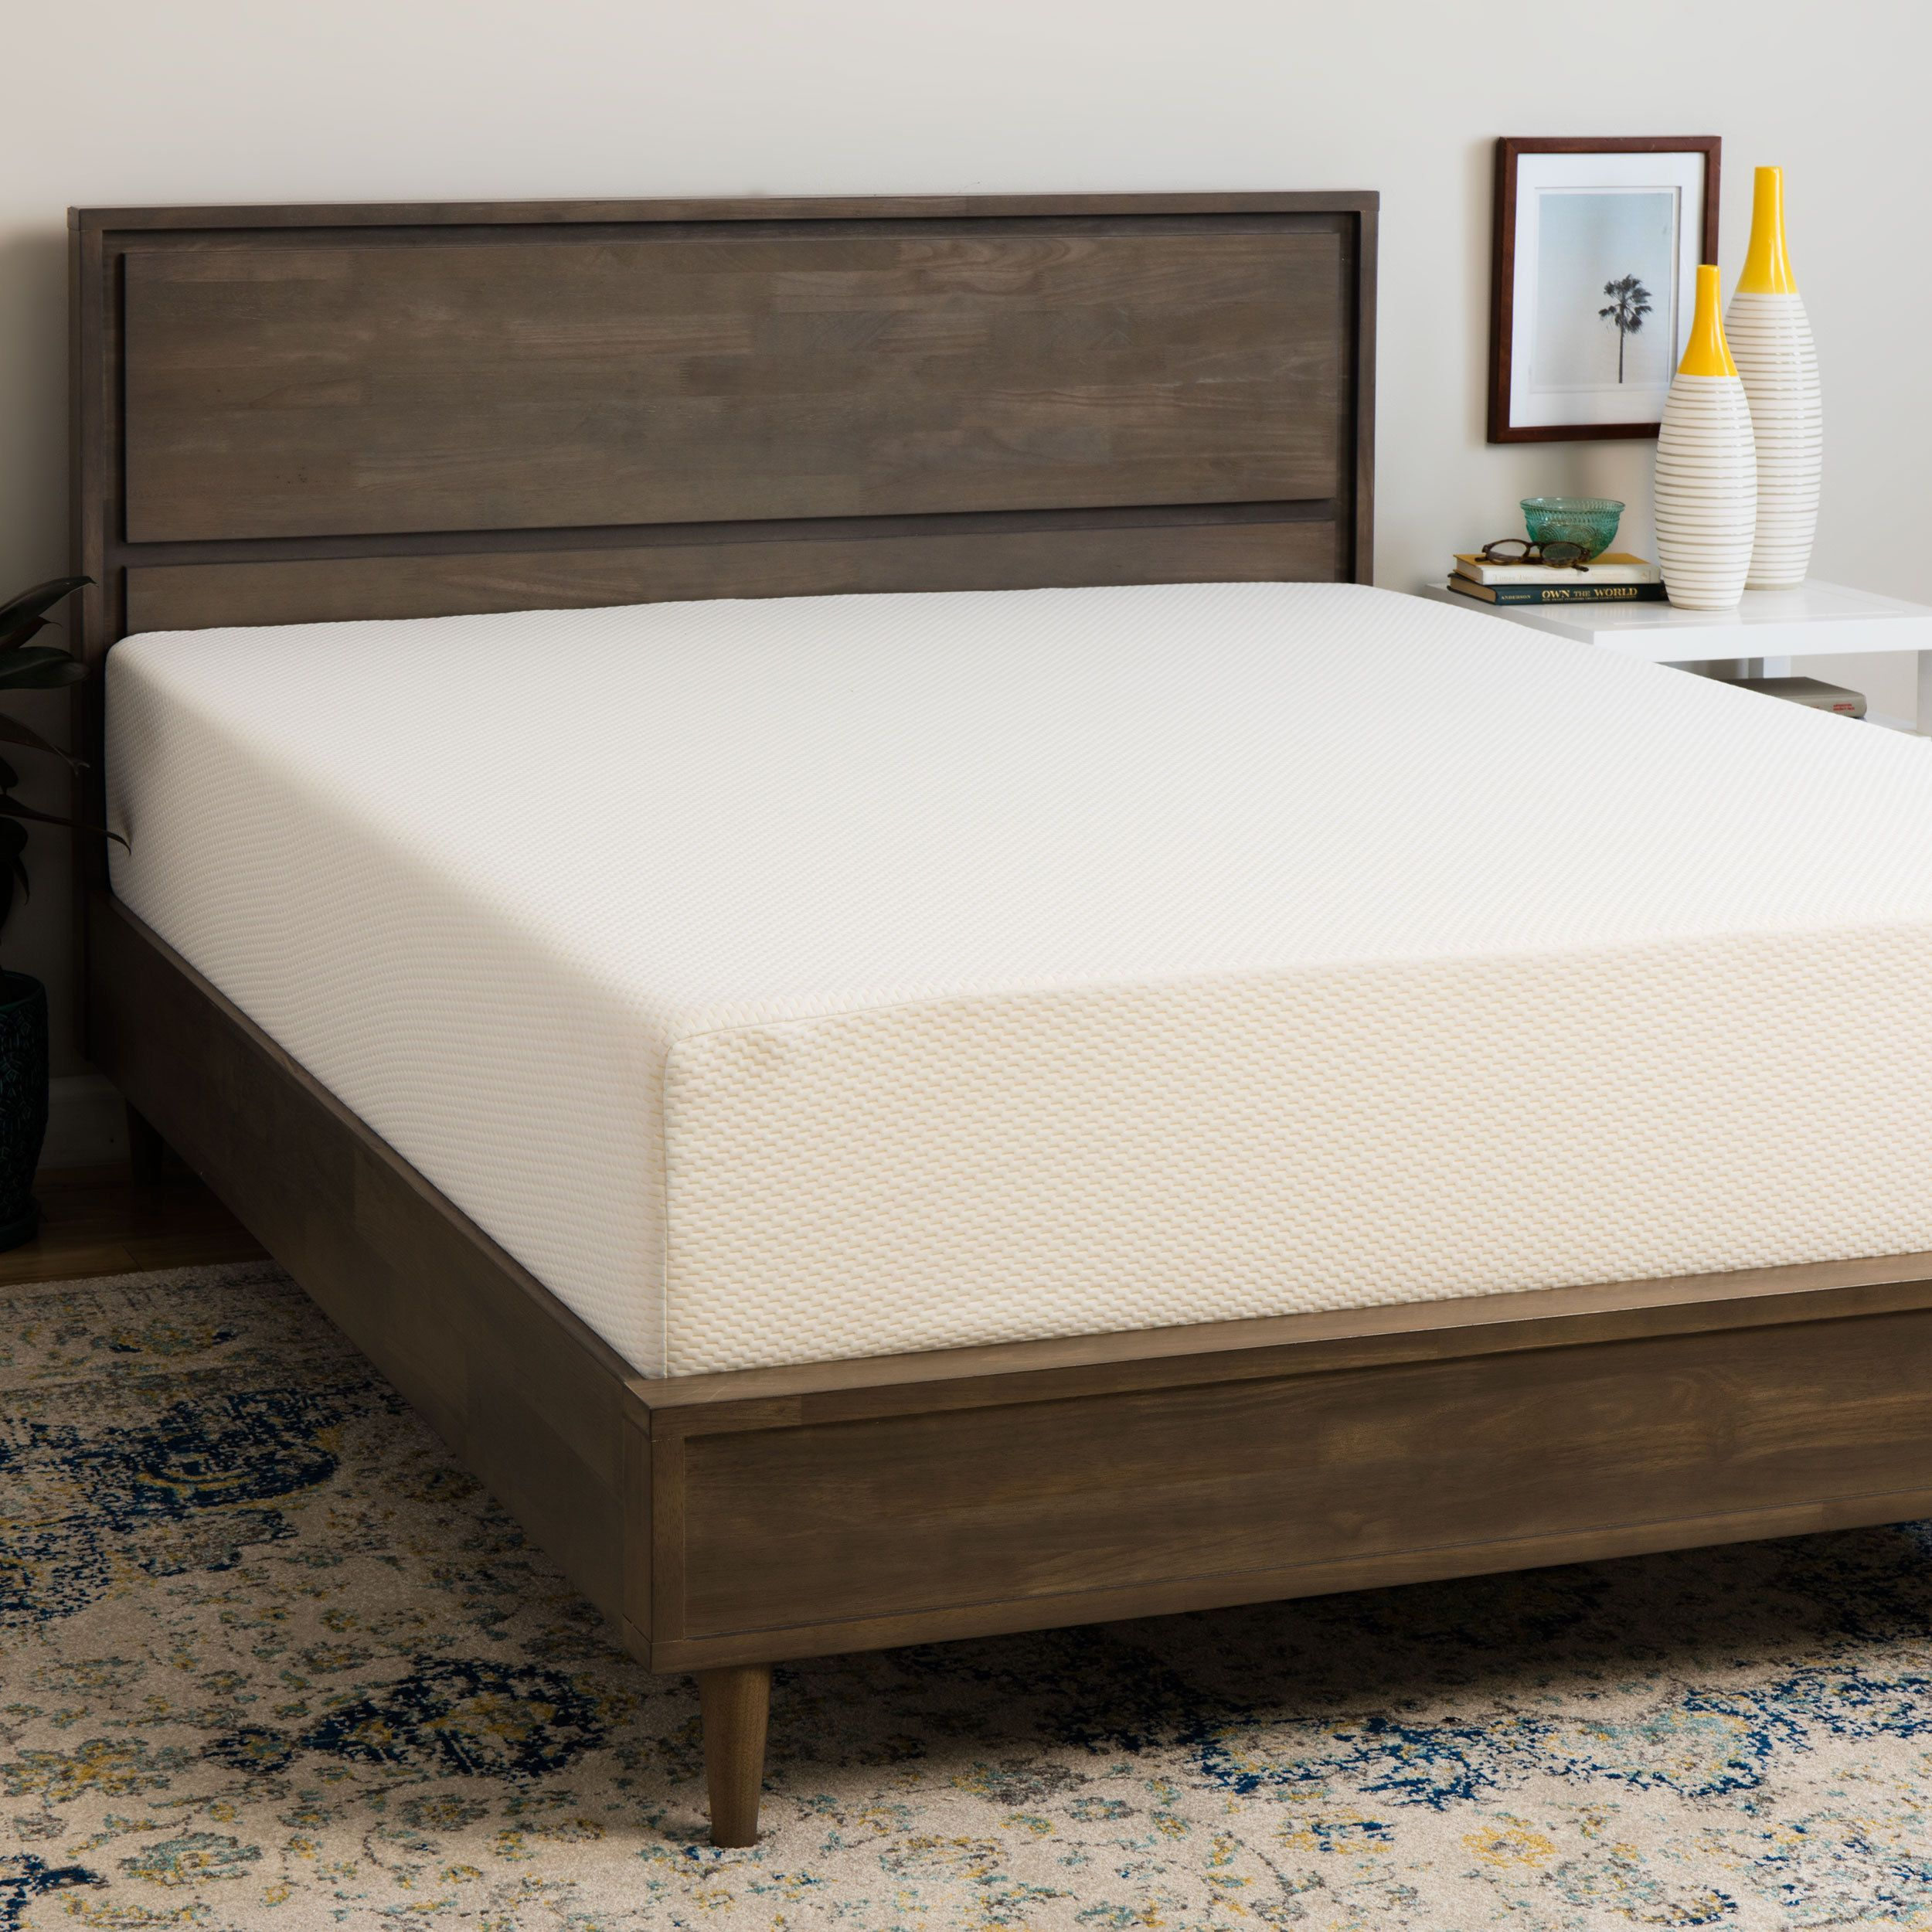 Select Luxury Medium Firm 14 Inch Twin Size Memory Foam Mattress Blue